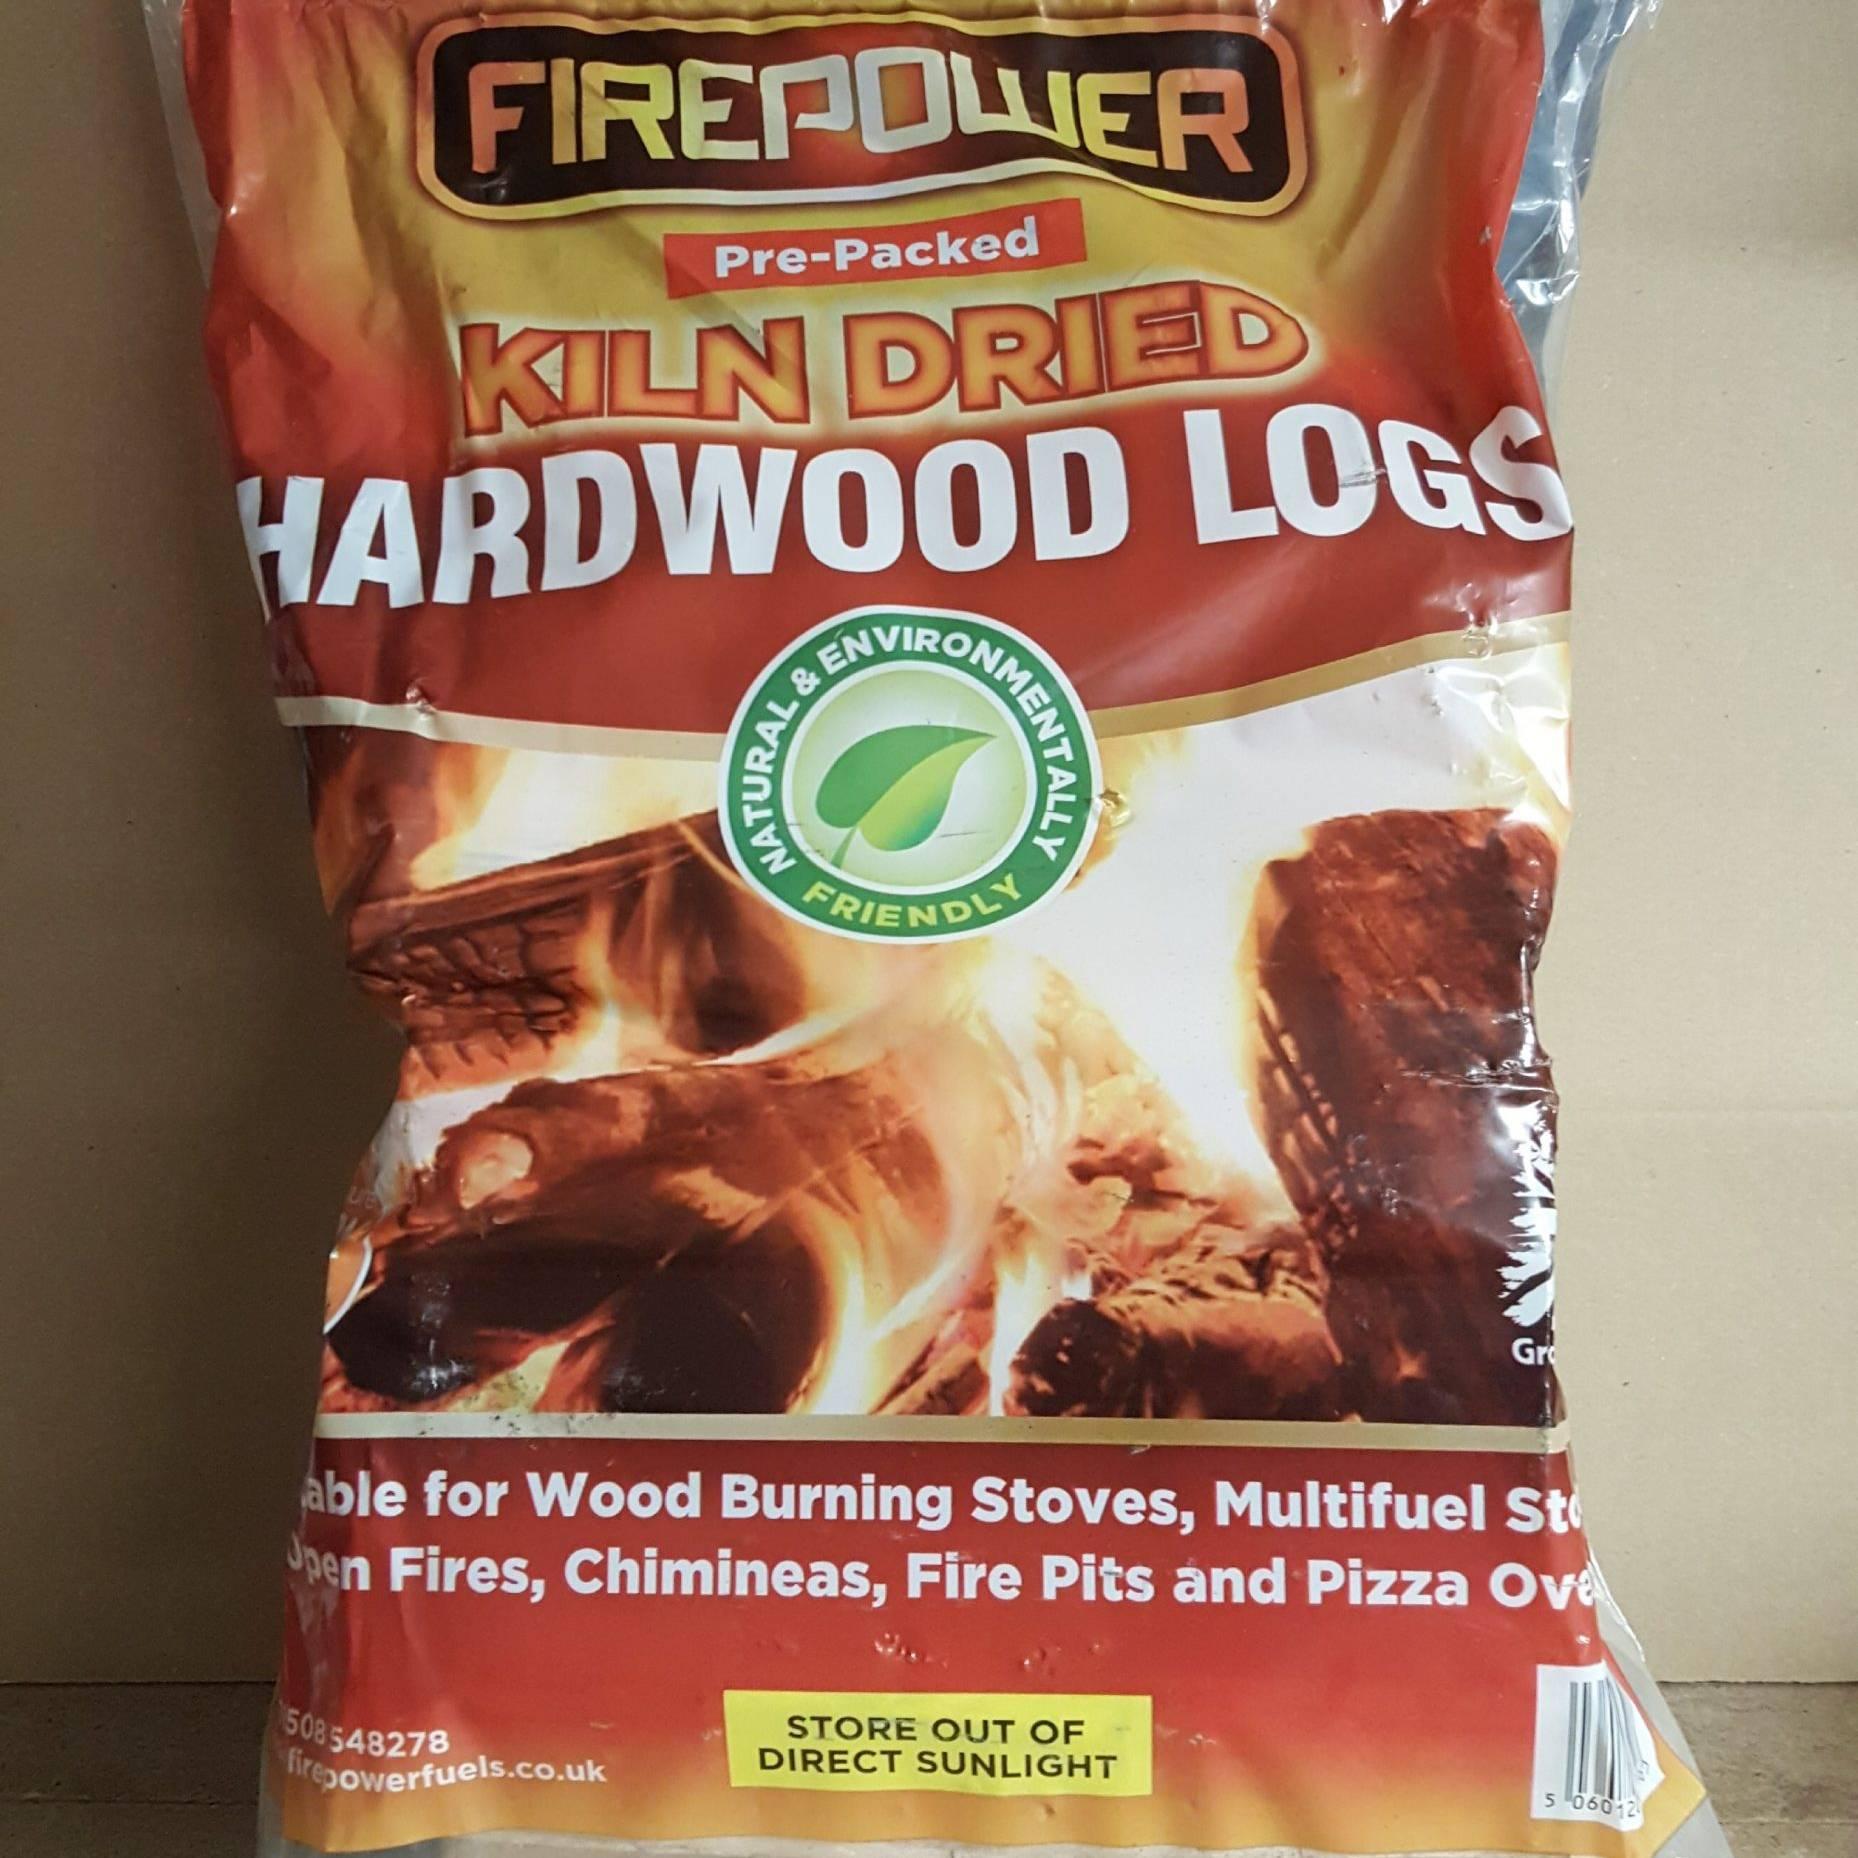 Pre-Packed Bag of Kiln Dried Hardwood Logs